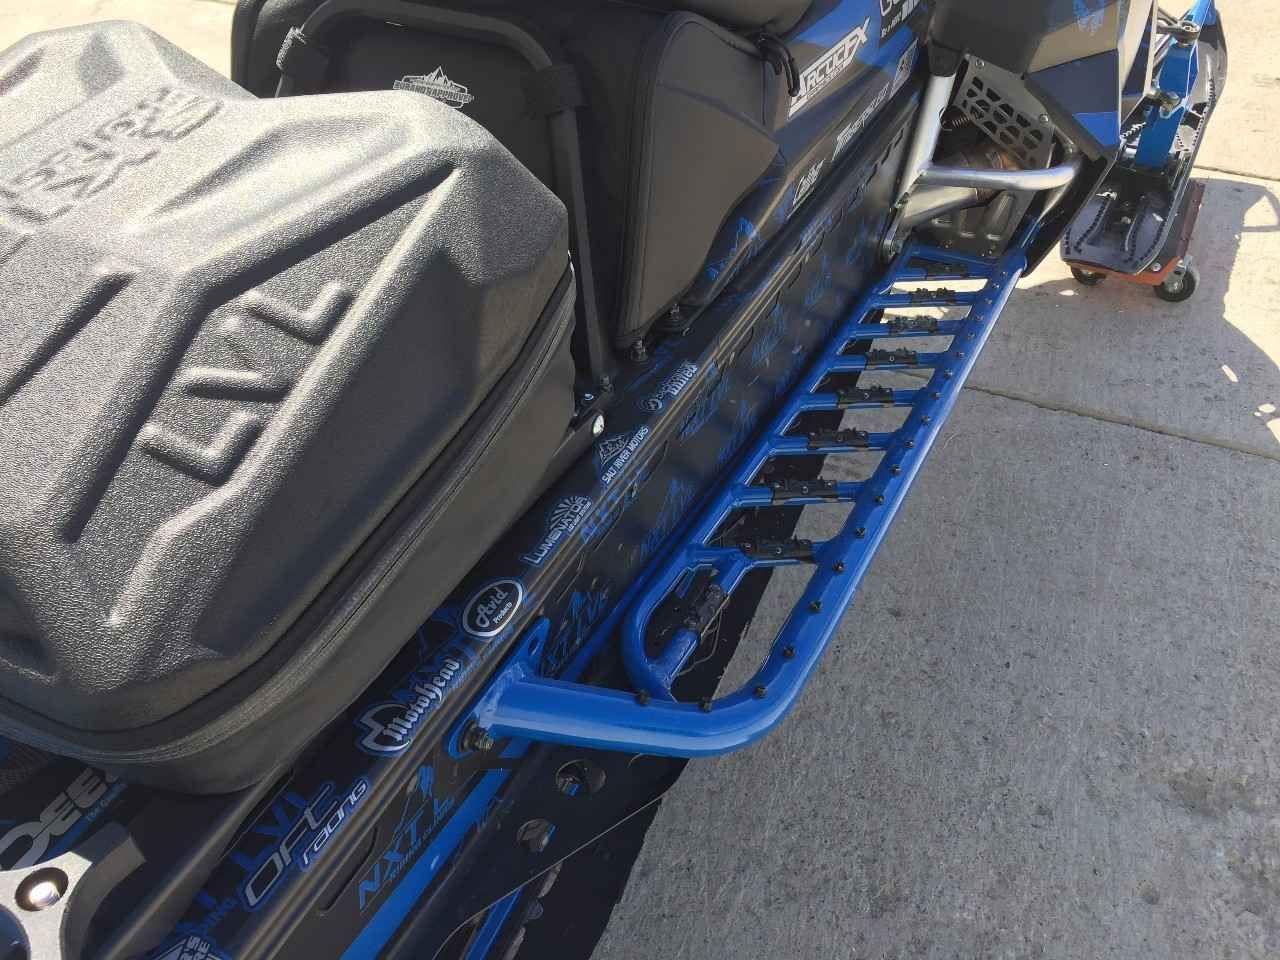 Used 2017 Polaris PRO RMK 800 Snowmobile For Sale in